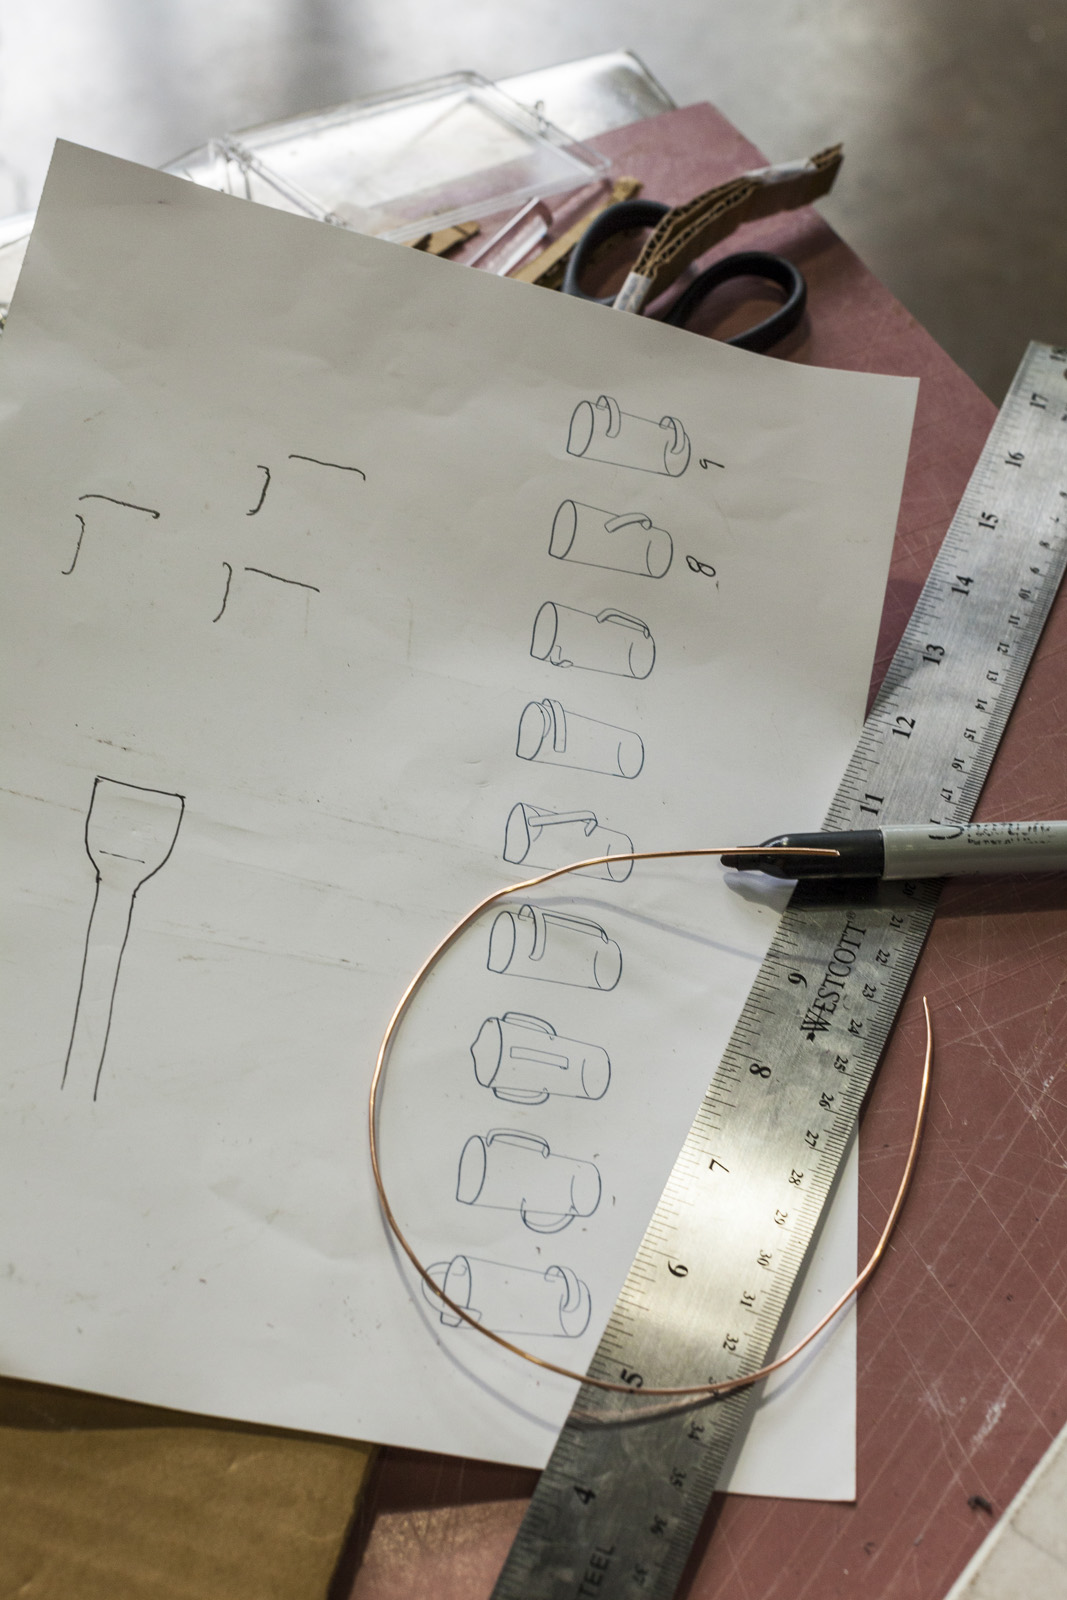 Design sketch for Nine Ways to Use a Pitcher, designed by Leon Ransmeier for GlassLab